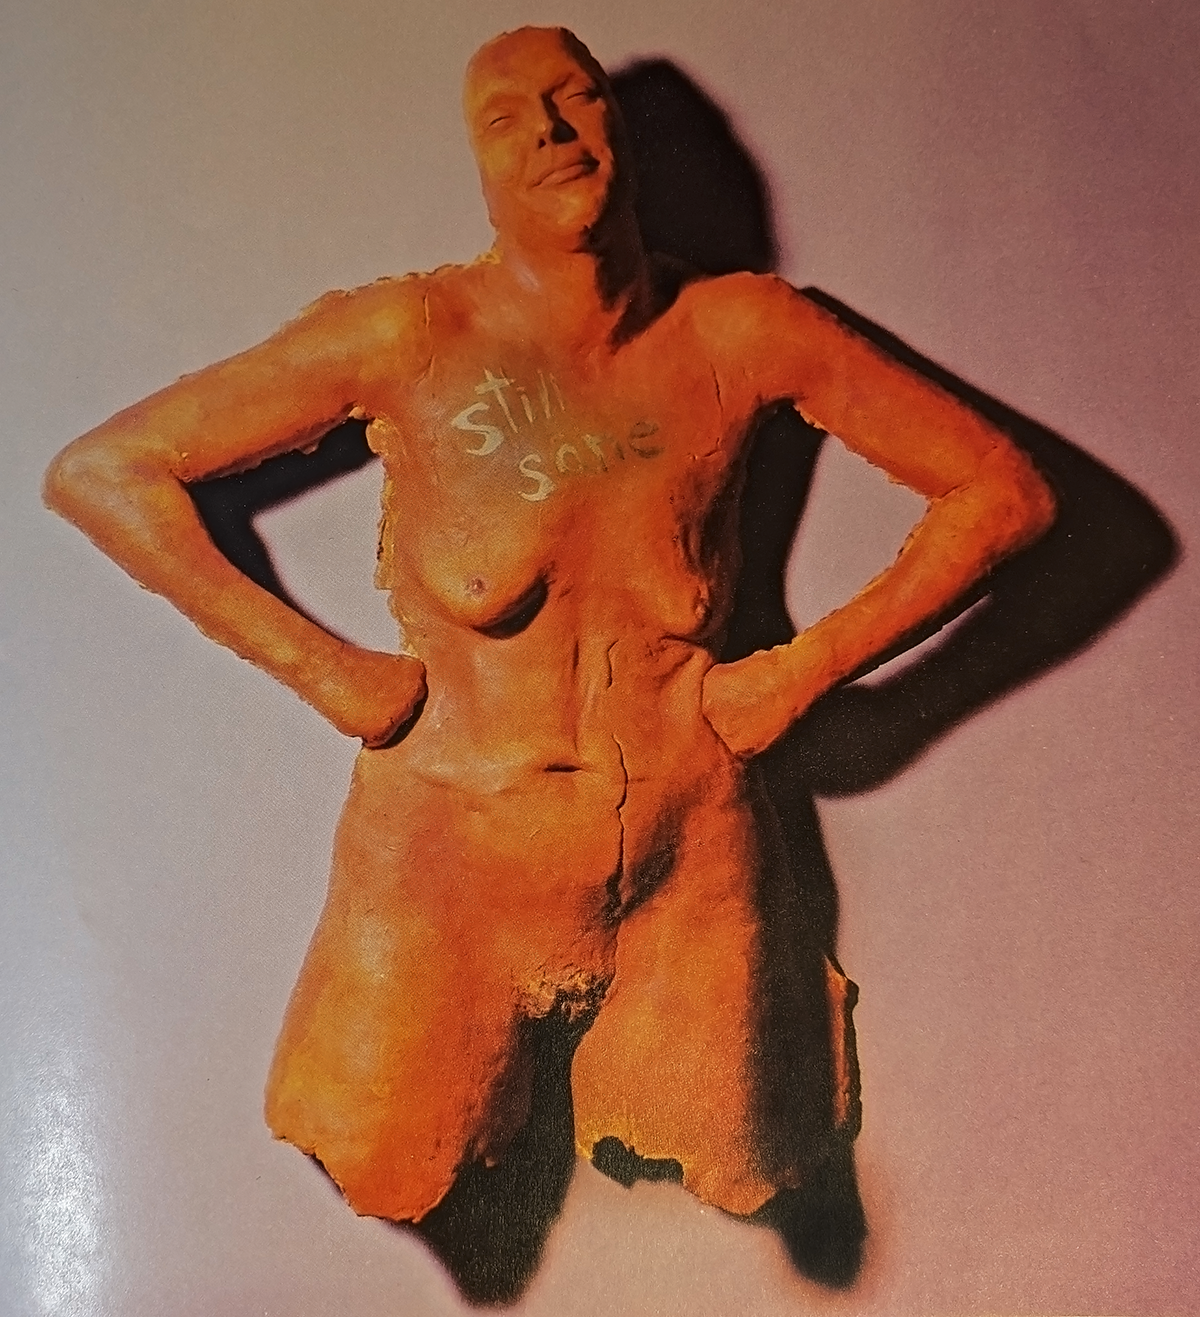 Image of sculpture by Persimmon Blackridge